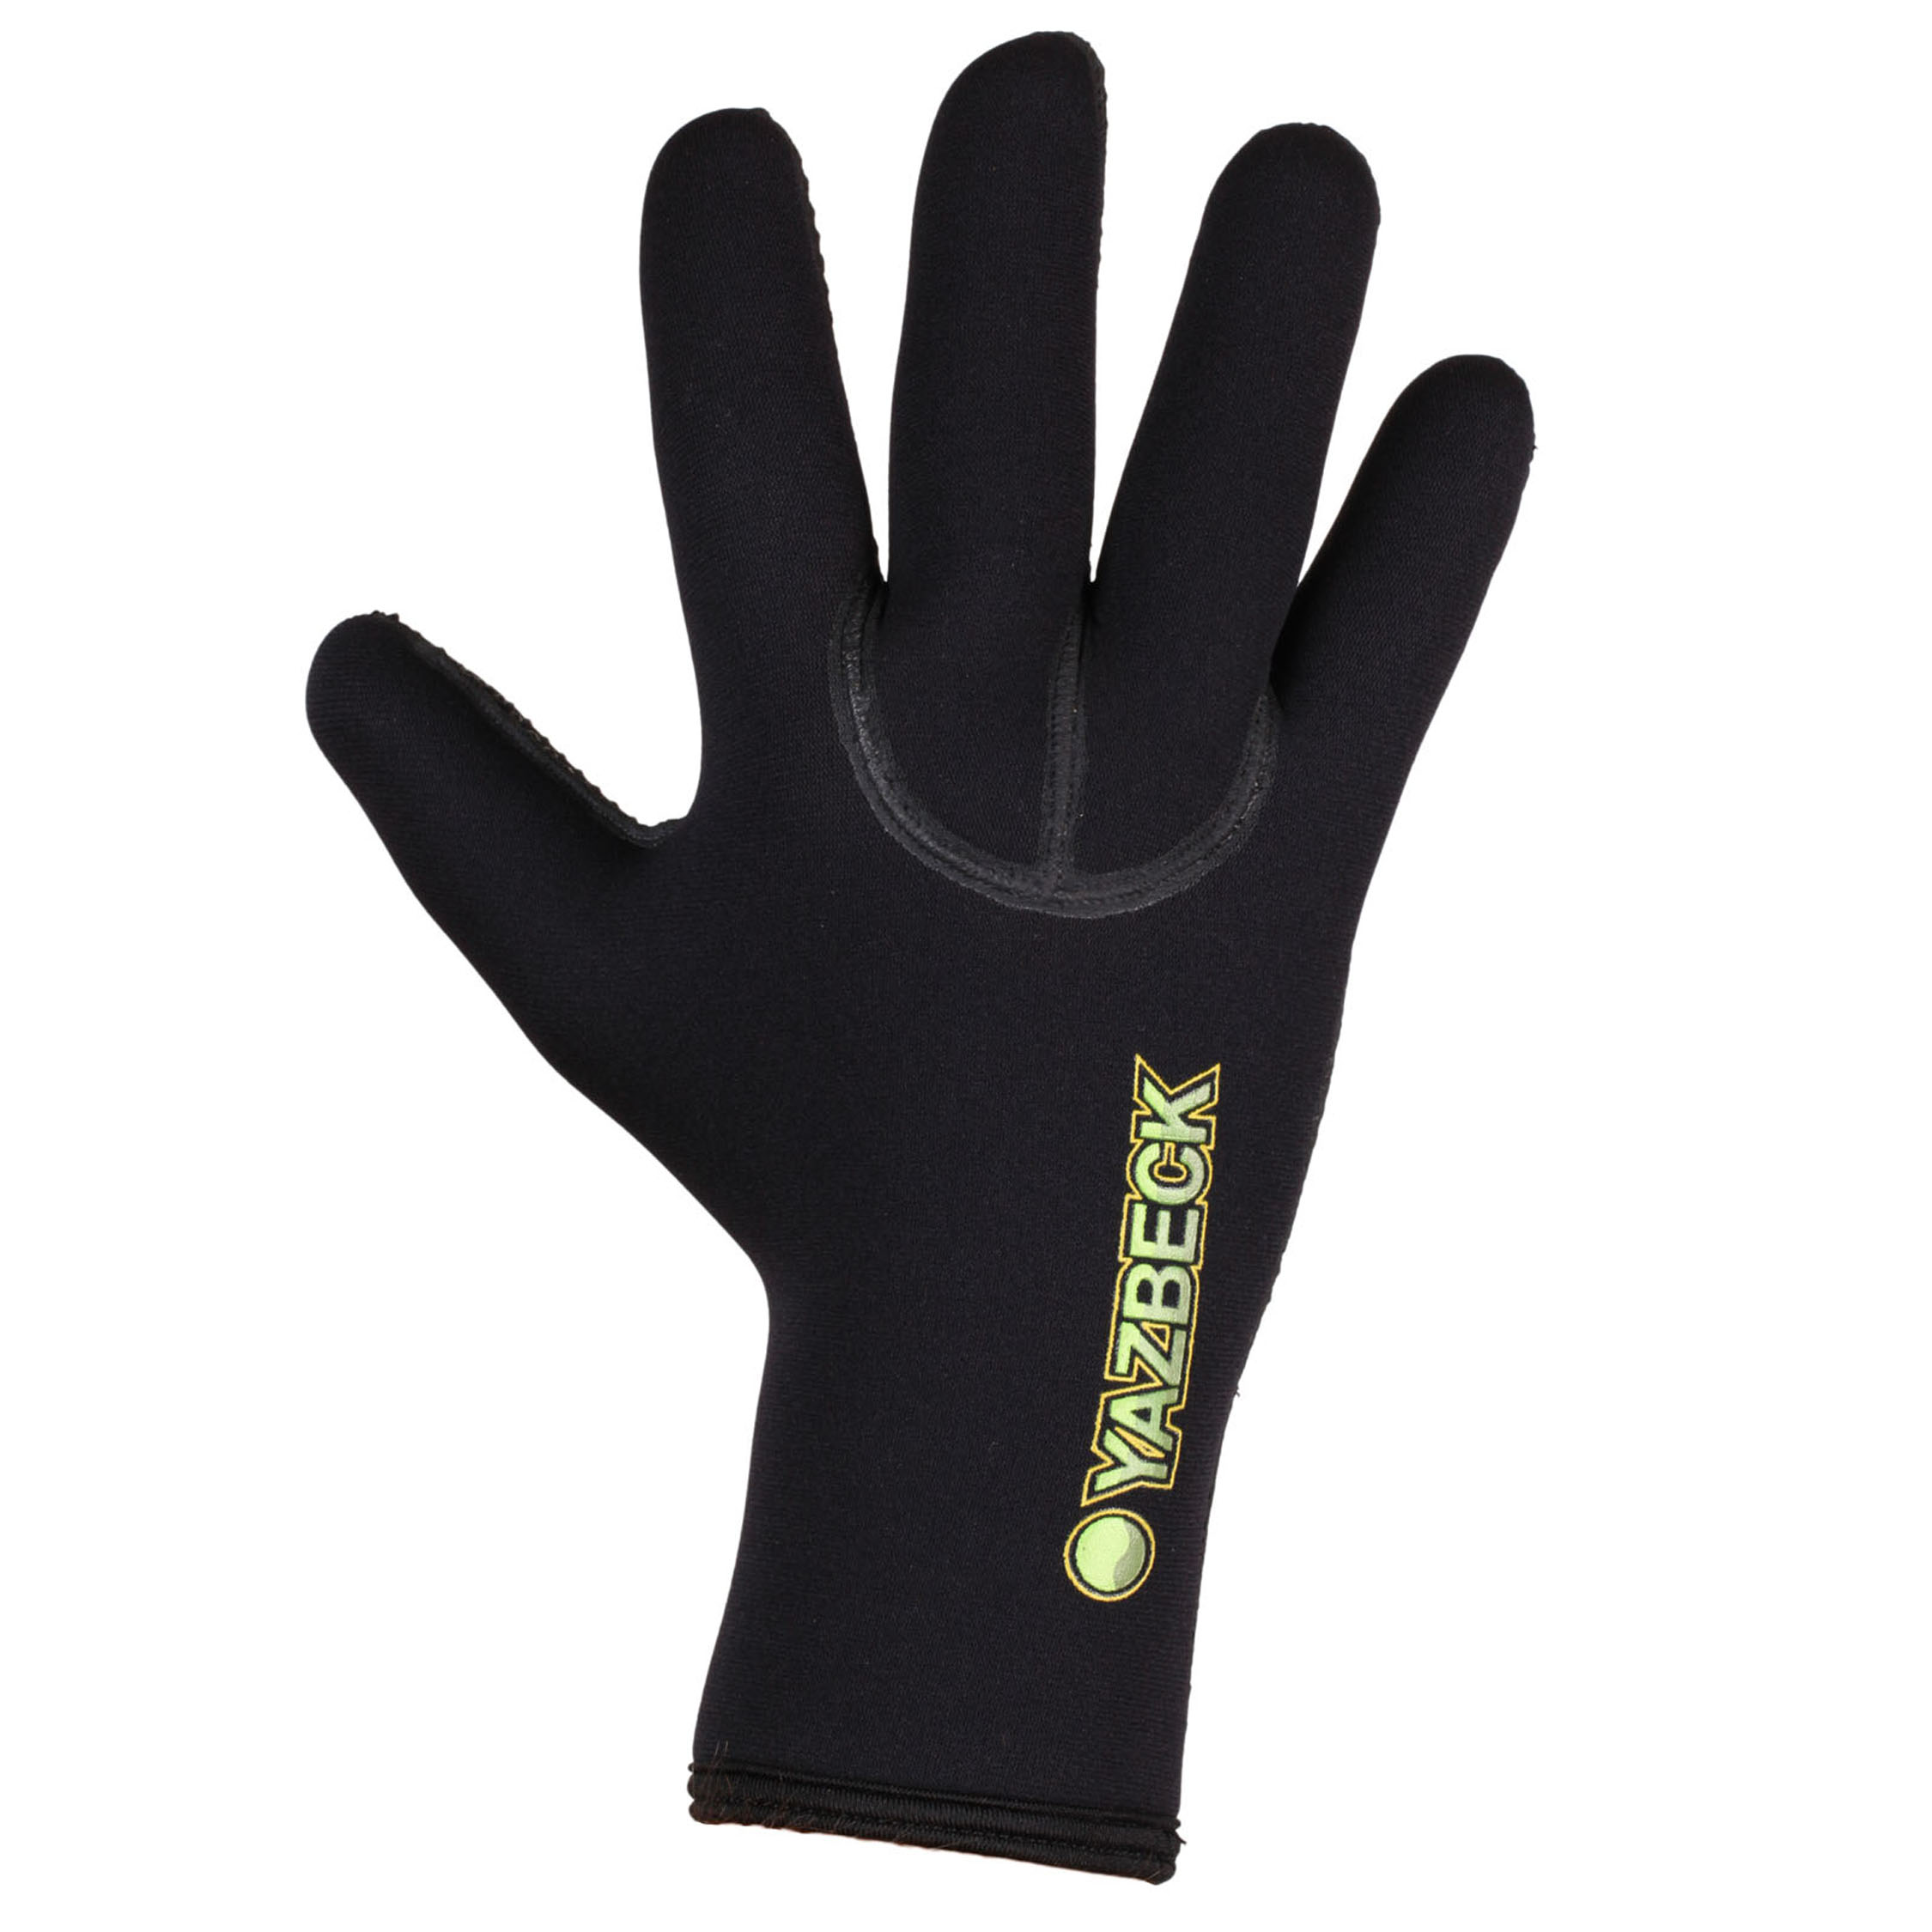 Yazbeck-ALLBLACK-Thermoflex-Titanium-Gloves-3mm-Spearfishing